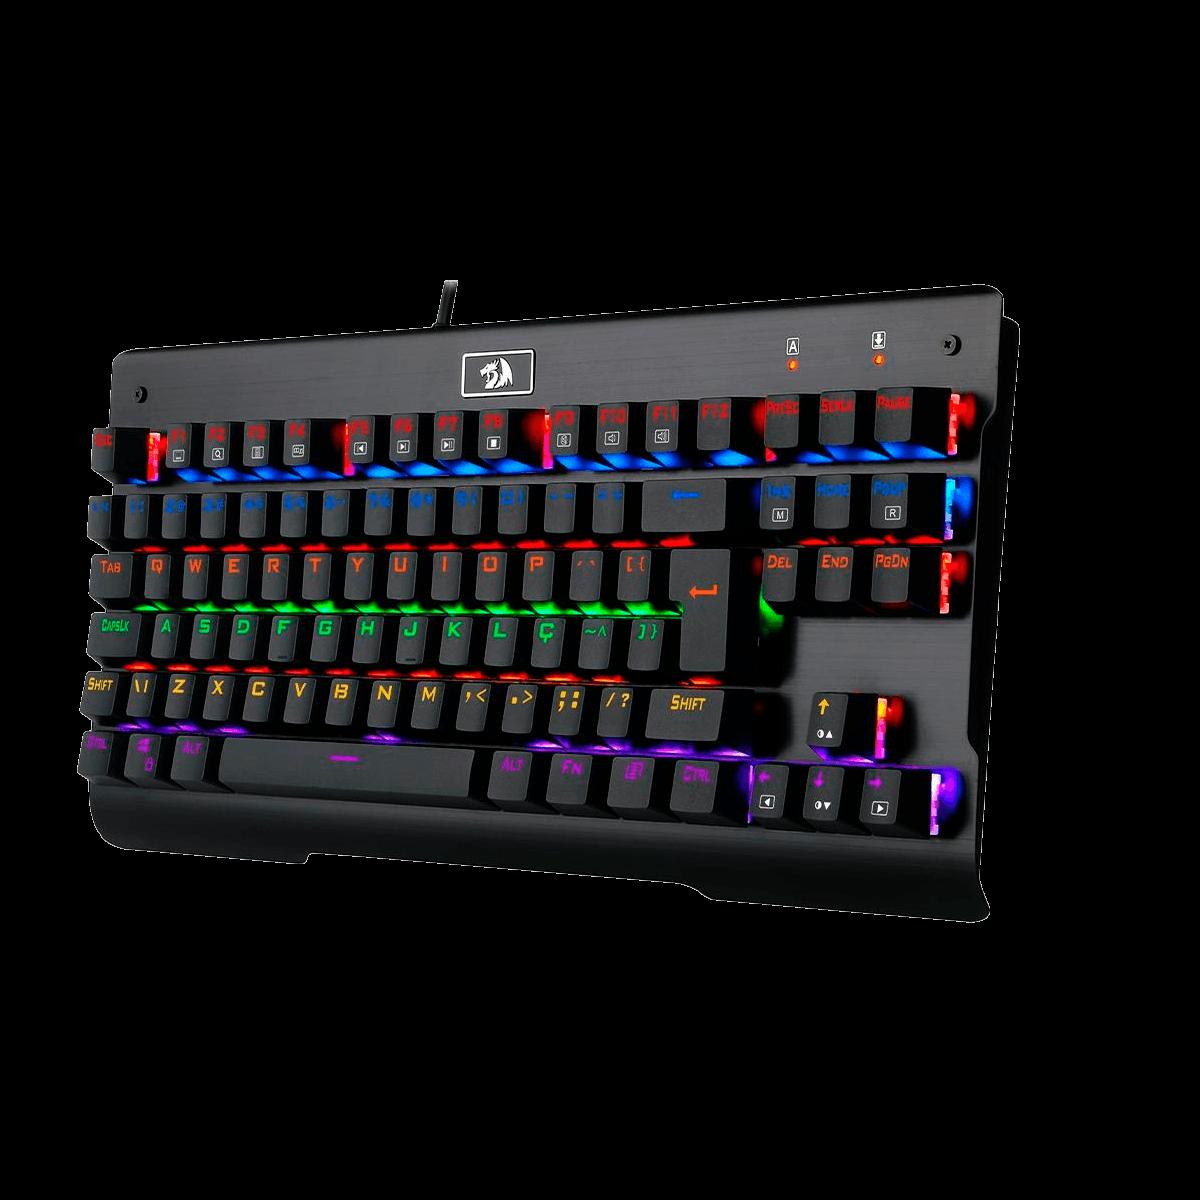 Teclado Mecânico Gamer Redragon Visnu, Switch Outemu Blue, Anti-Ghosting, Preto, ABNT2 - K561R-2 (PT-BLUE)